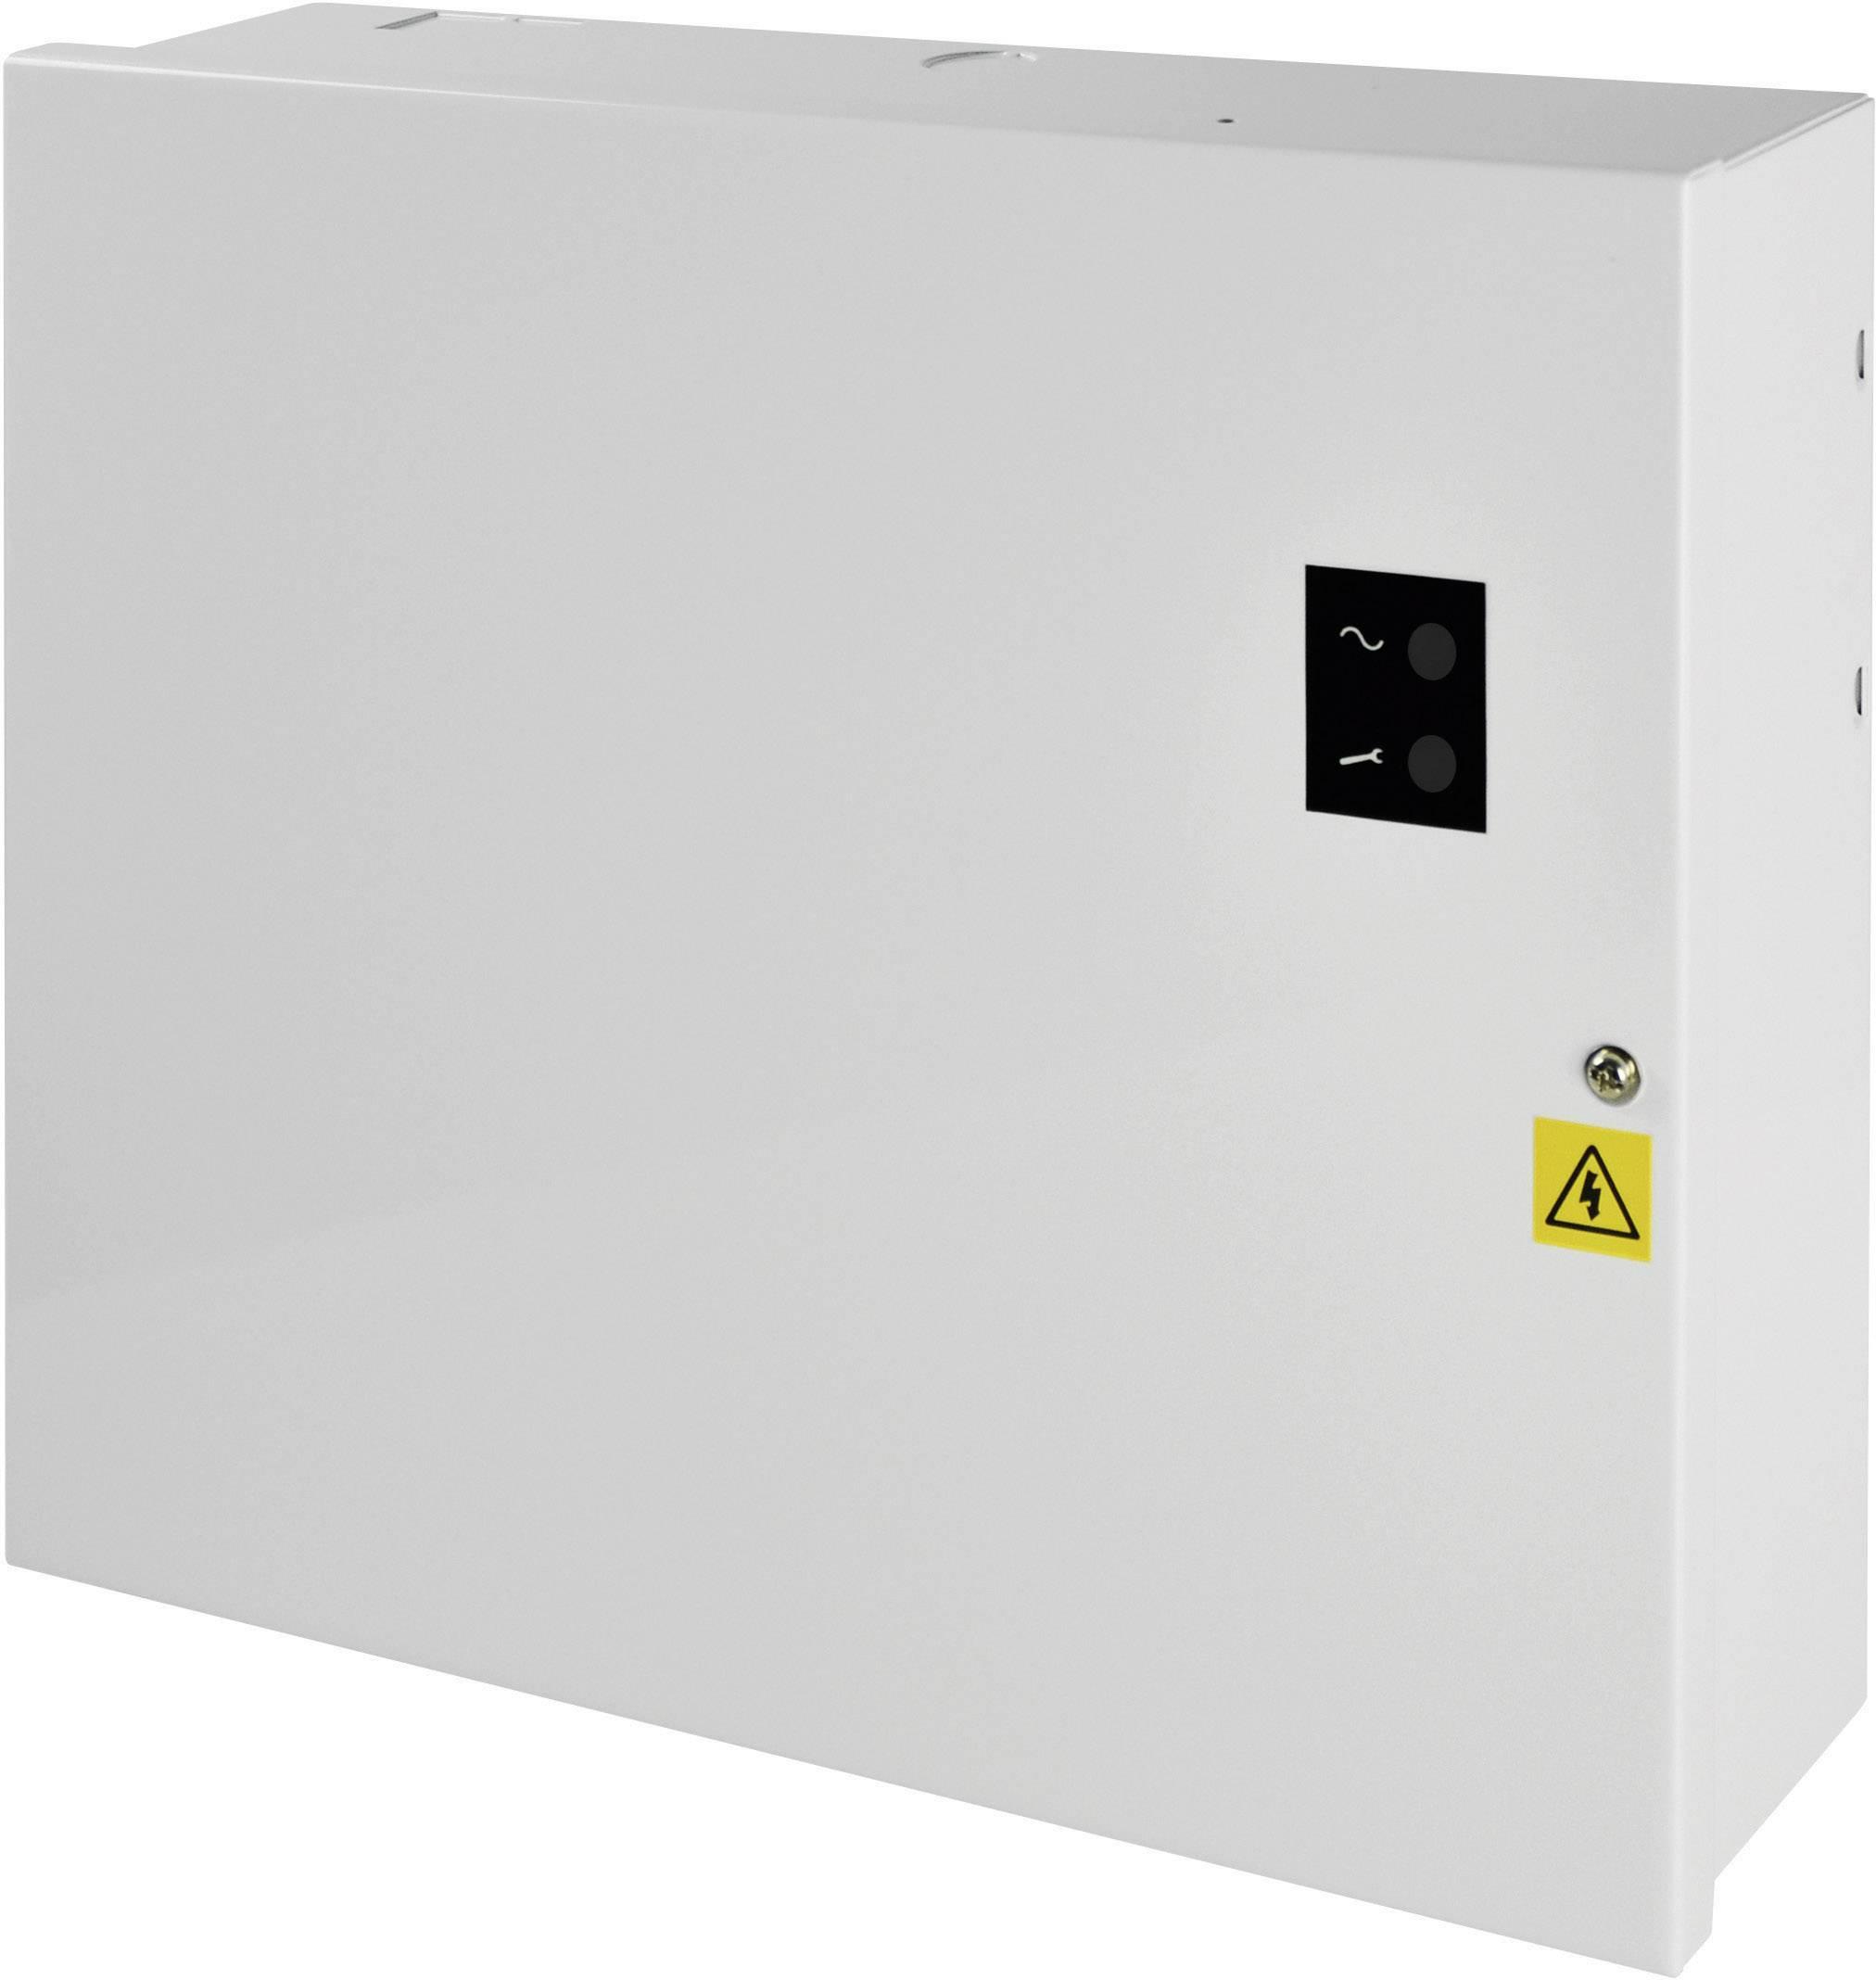 Napájecí adaptér ABUS pro CCTV systémy, 13.8 VDC, 3 A